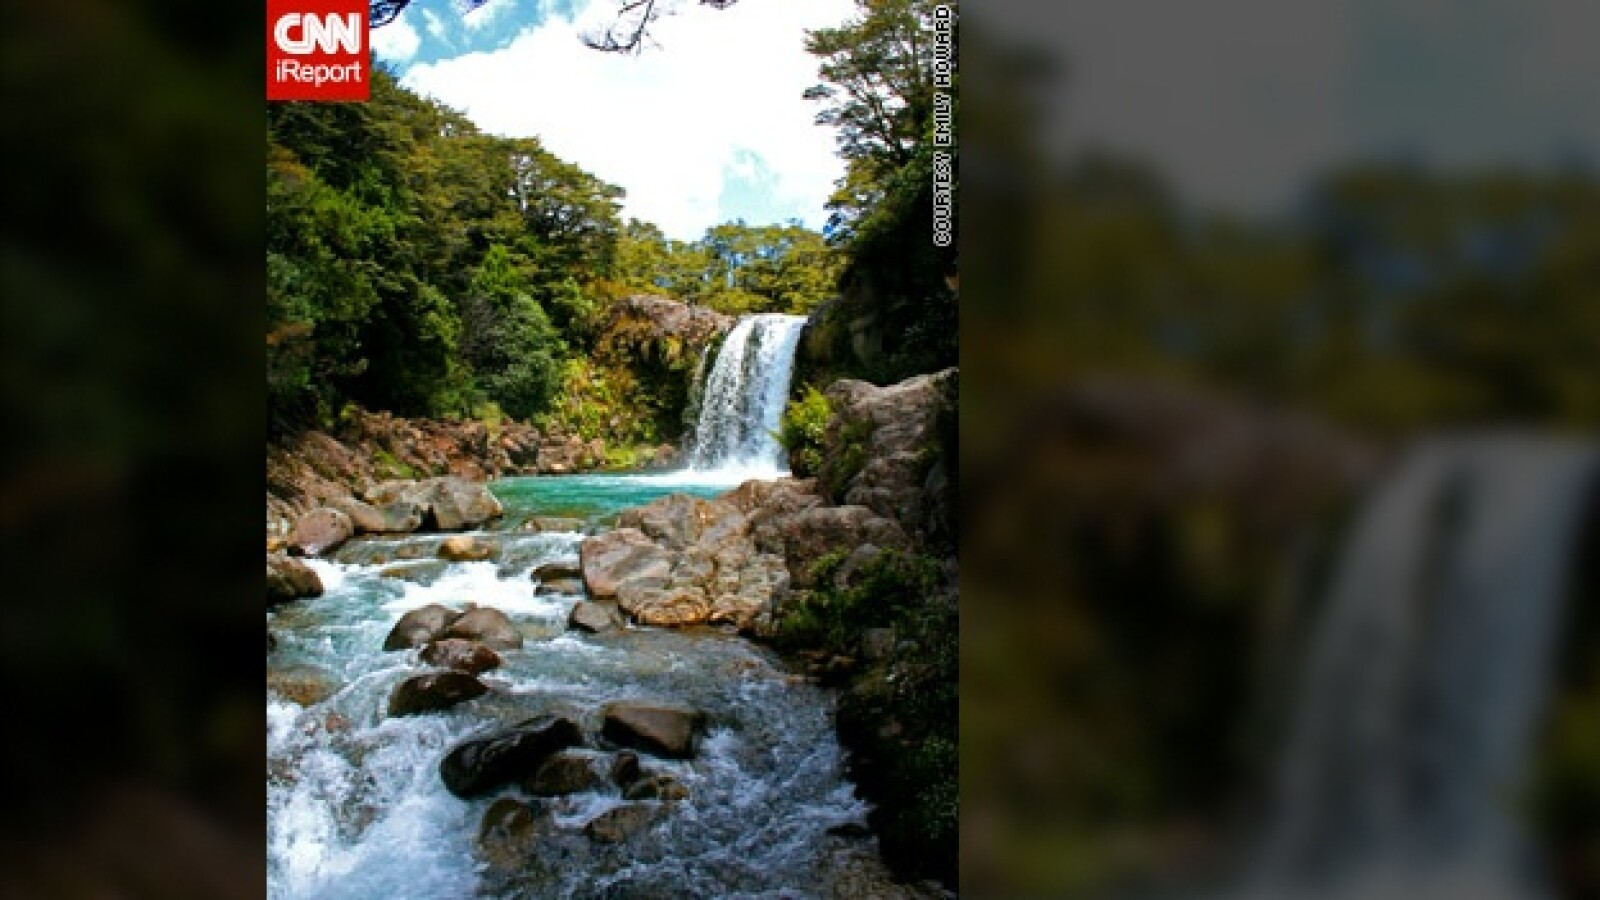 nueva zelandia ireport viajes destinos europa